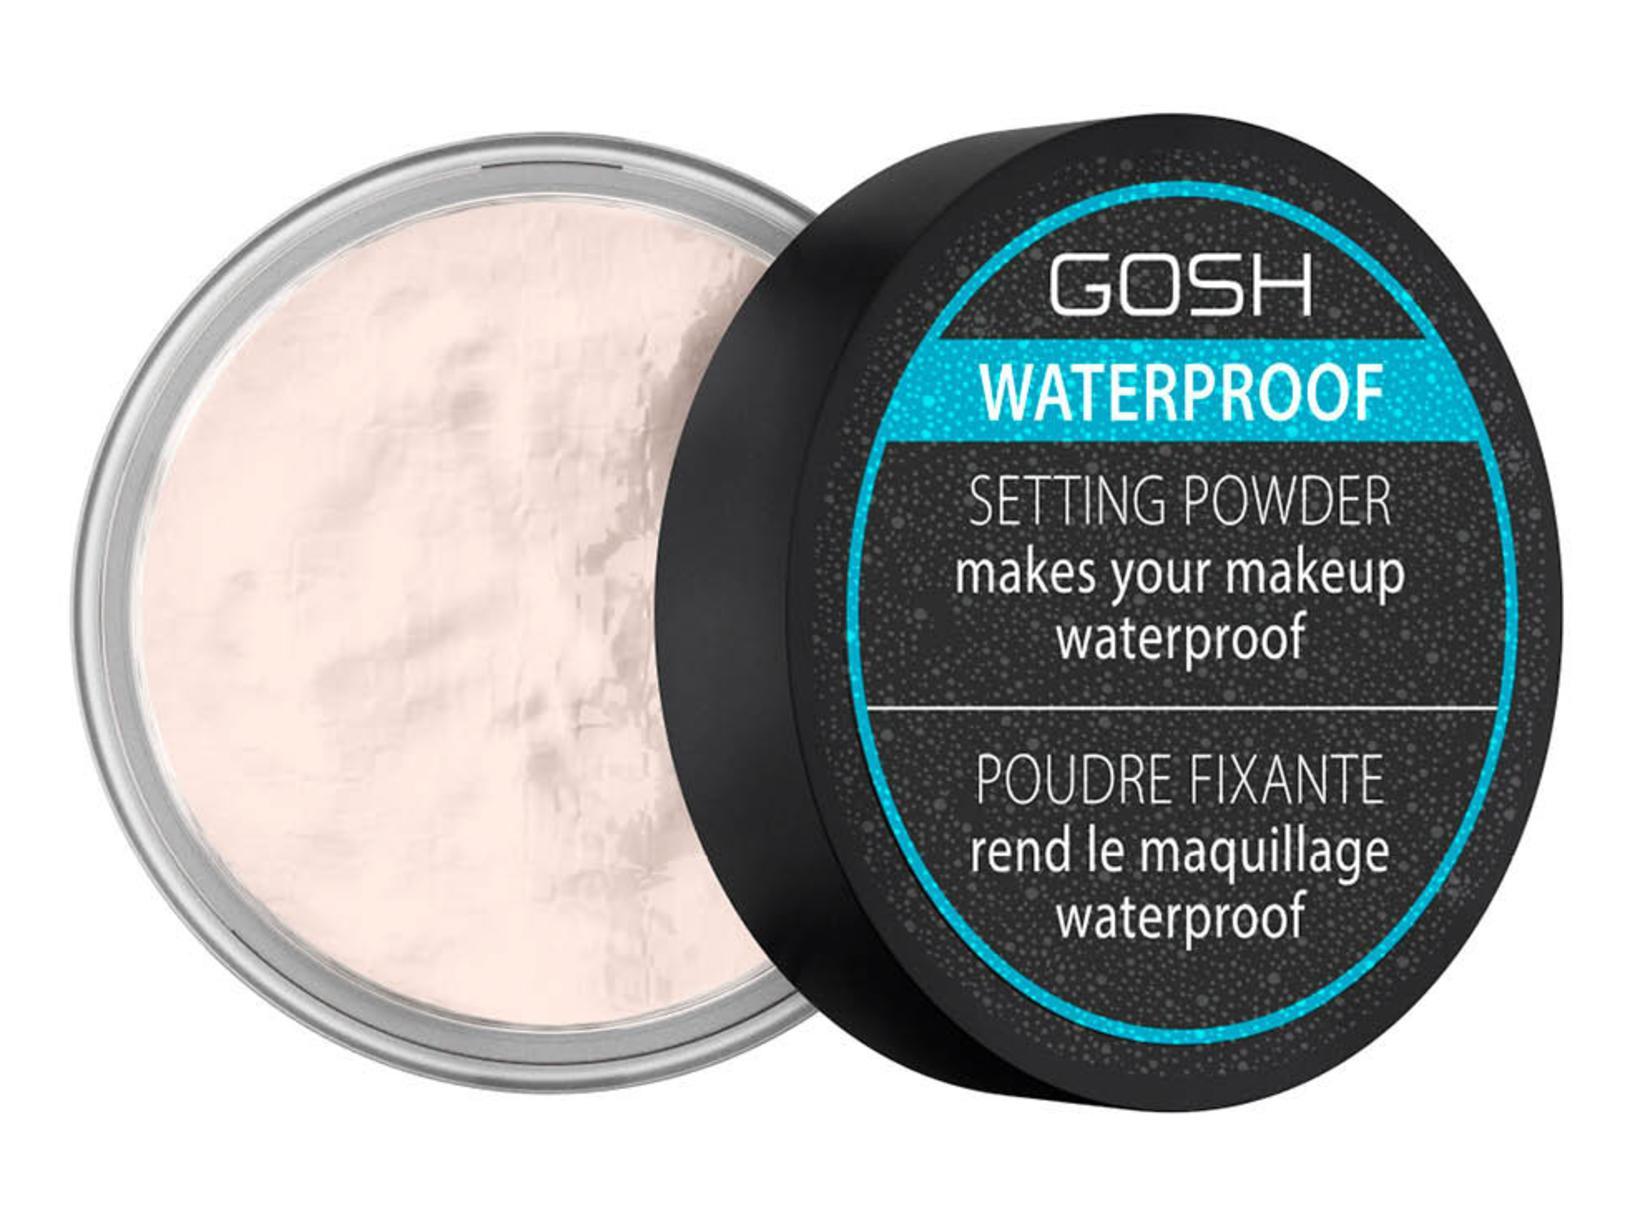 GOSH Waterproof Setting Powder, 1.499 kr.